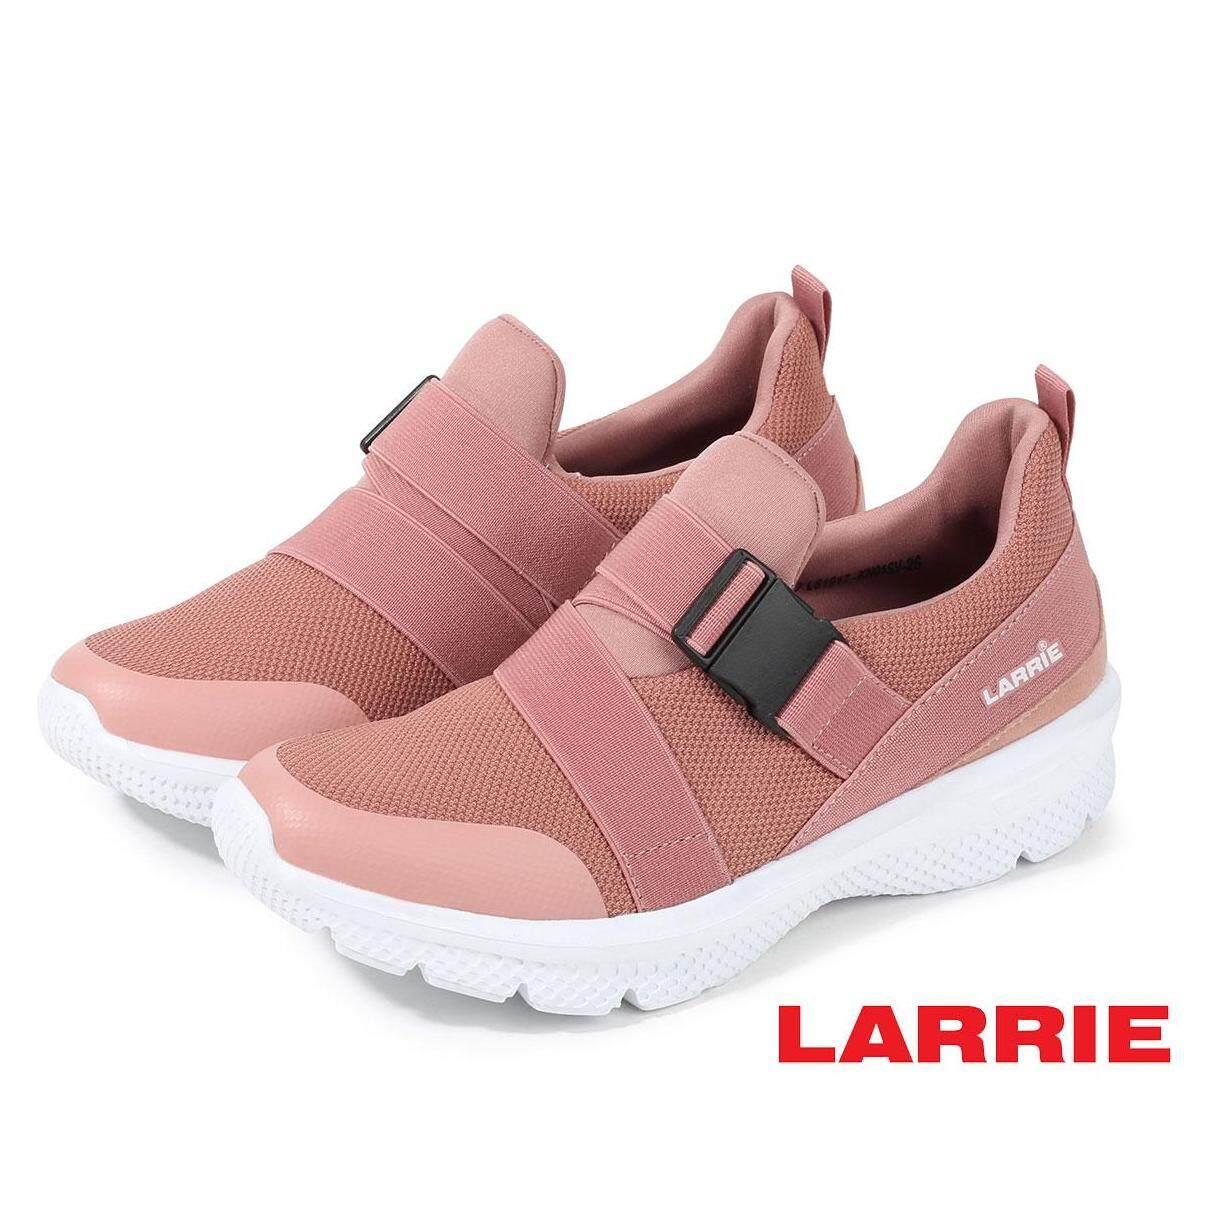 LARRIE Kasut Perempuan Lite Sporty Vogue Sneakers - L61917-KN01SV